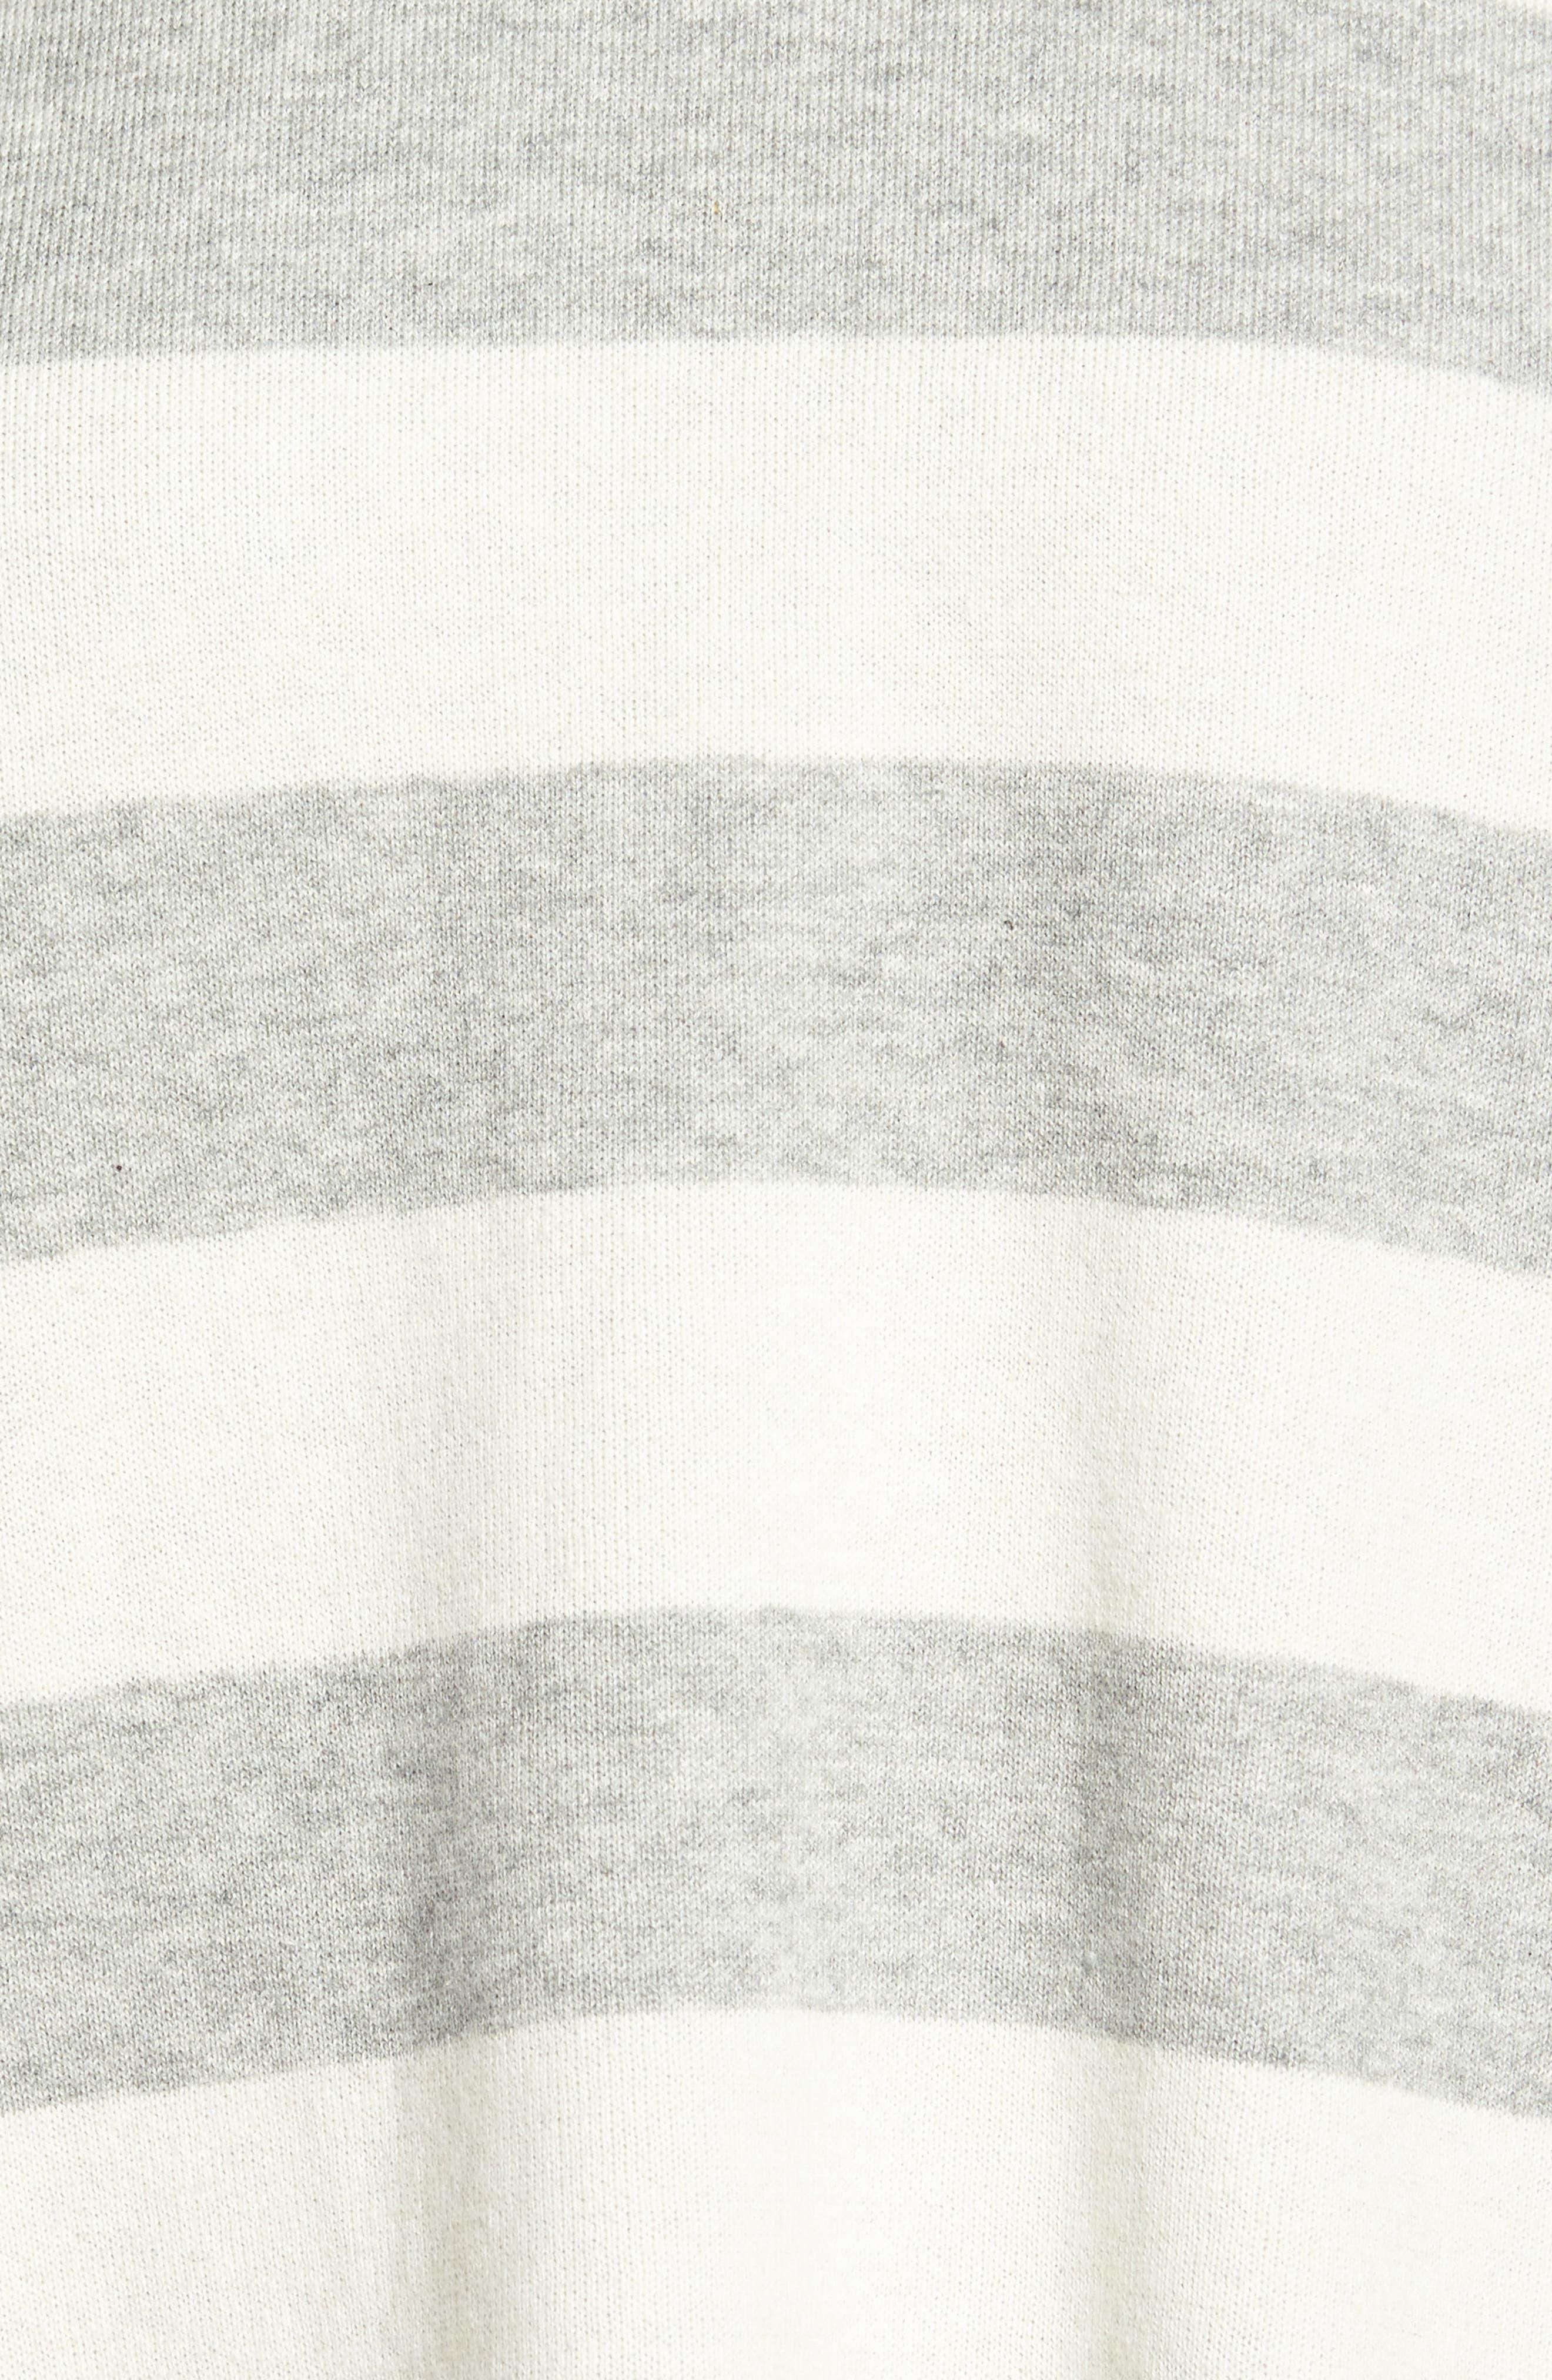 Stripe Organic Cotton Blend Top,                             Alternate thumbnail 5, color,                             038